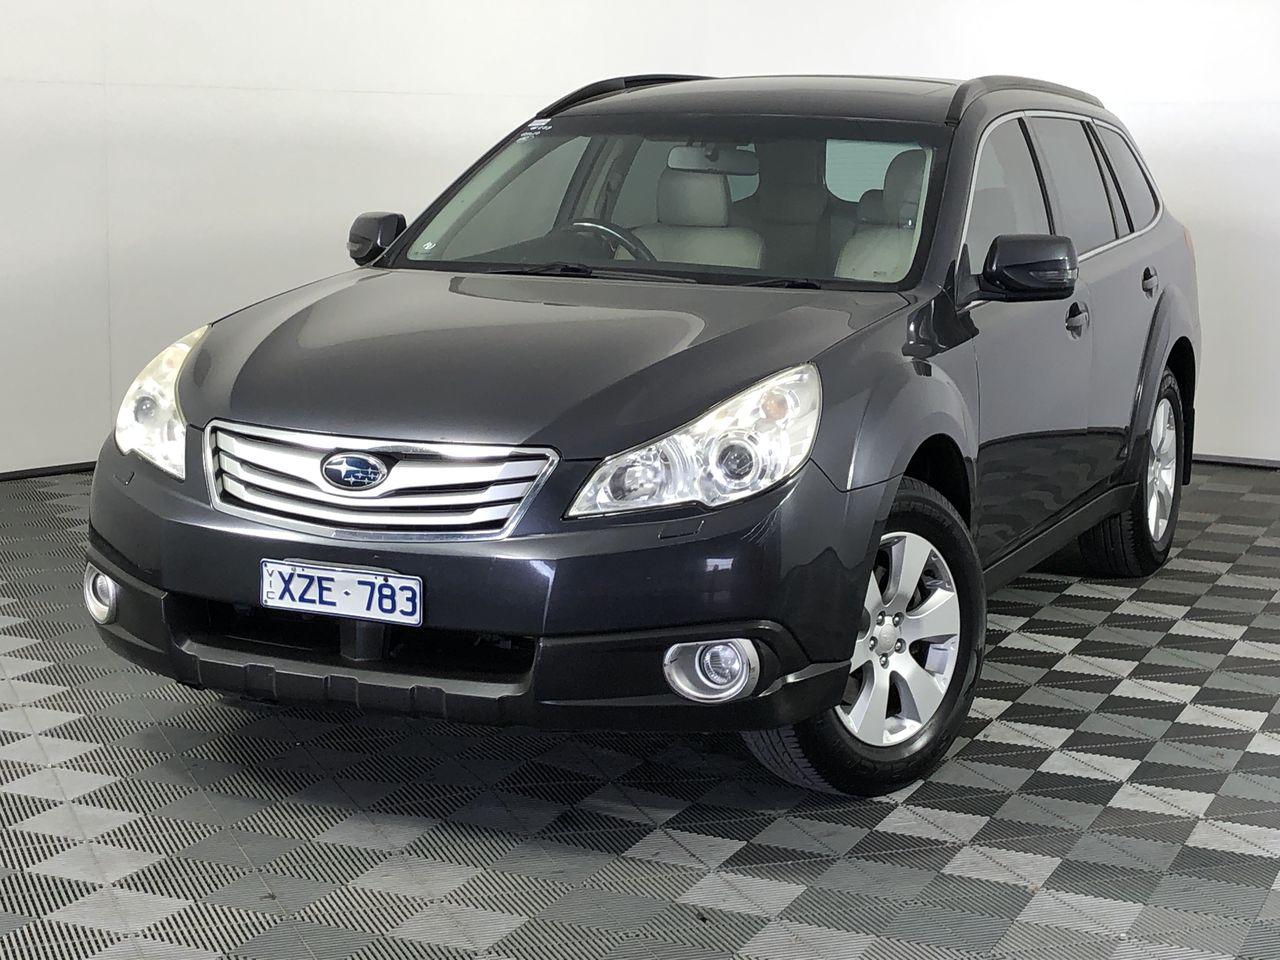 2010 Subaru Outback 3.6R PREMIUM B5A Automatic Wagon